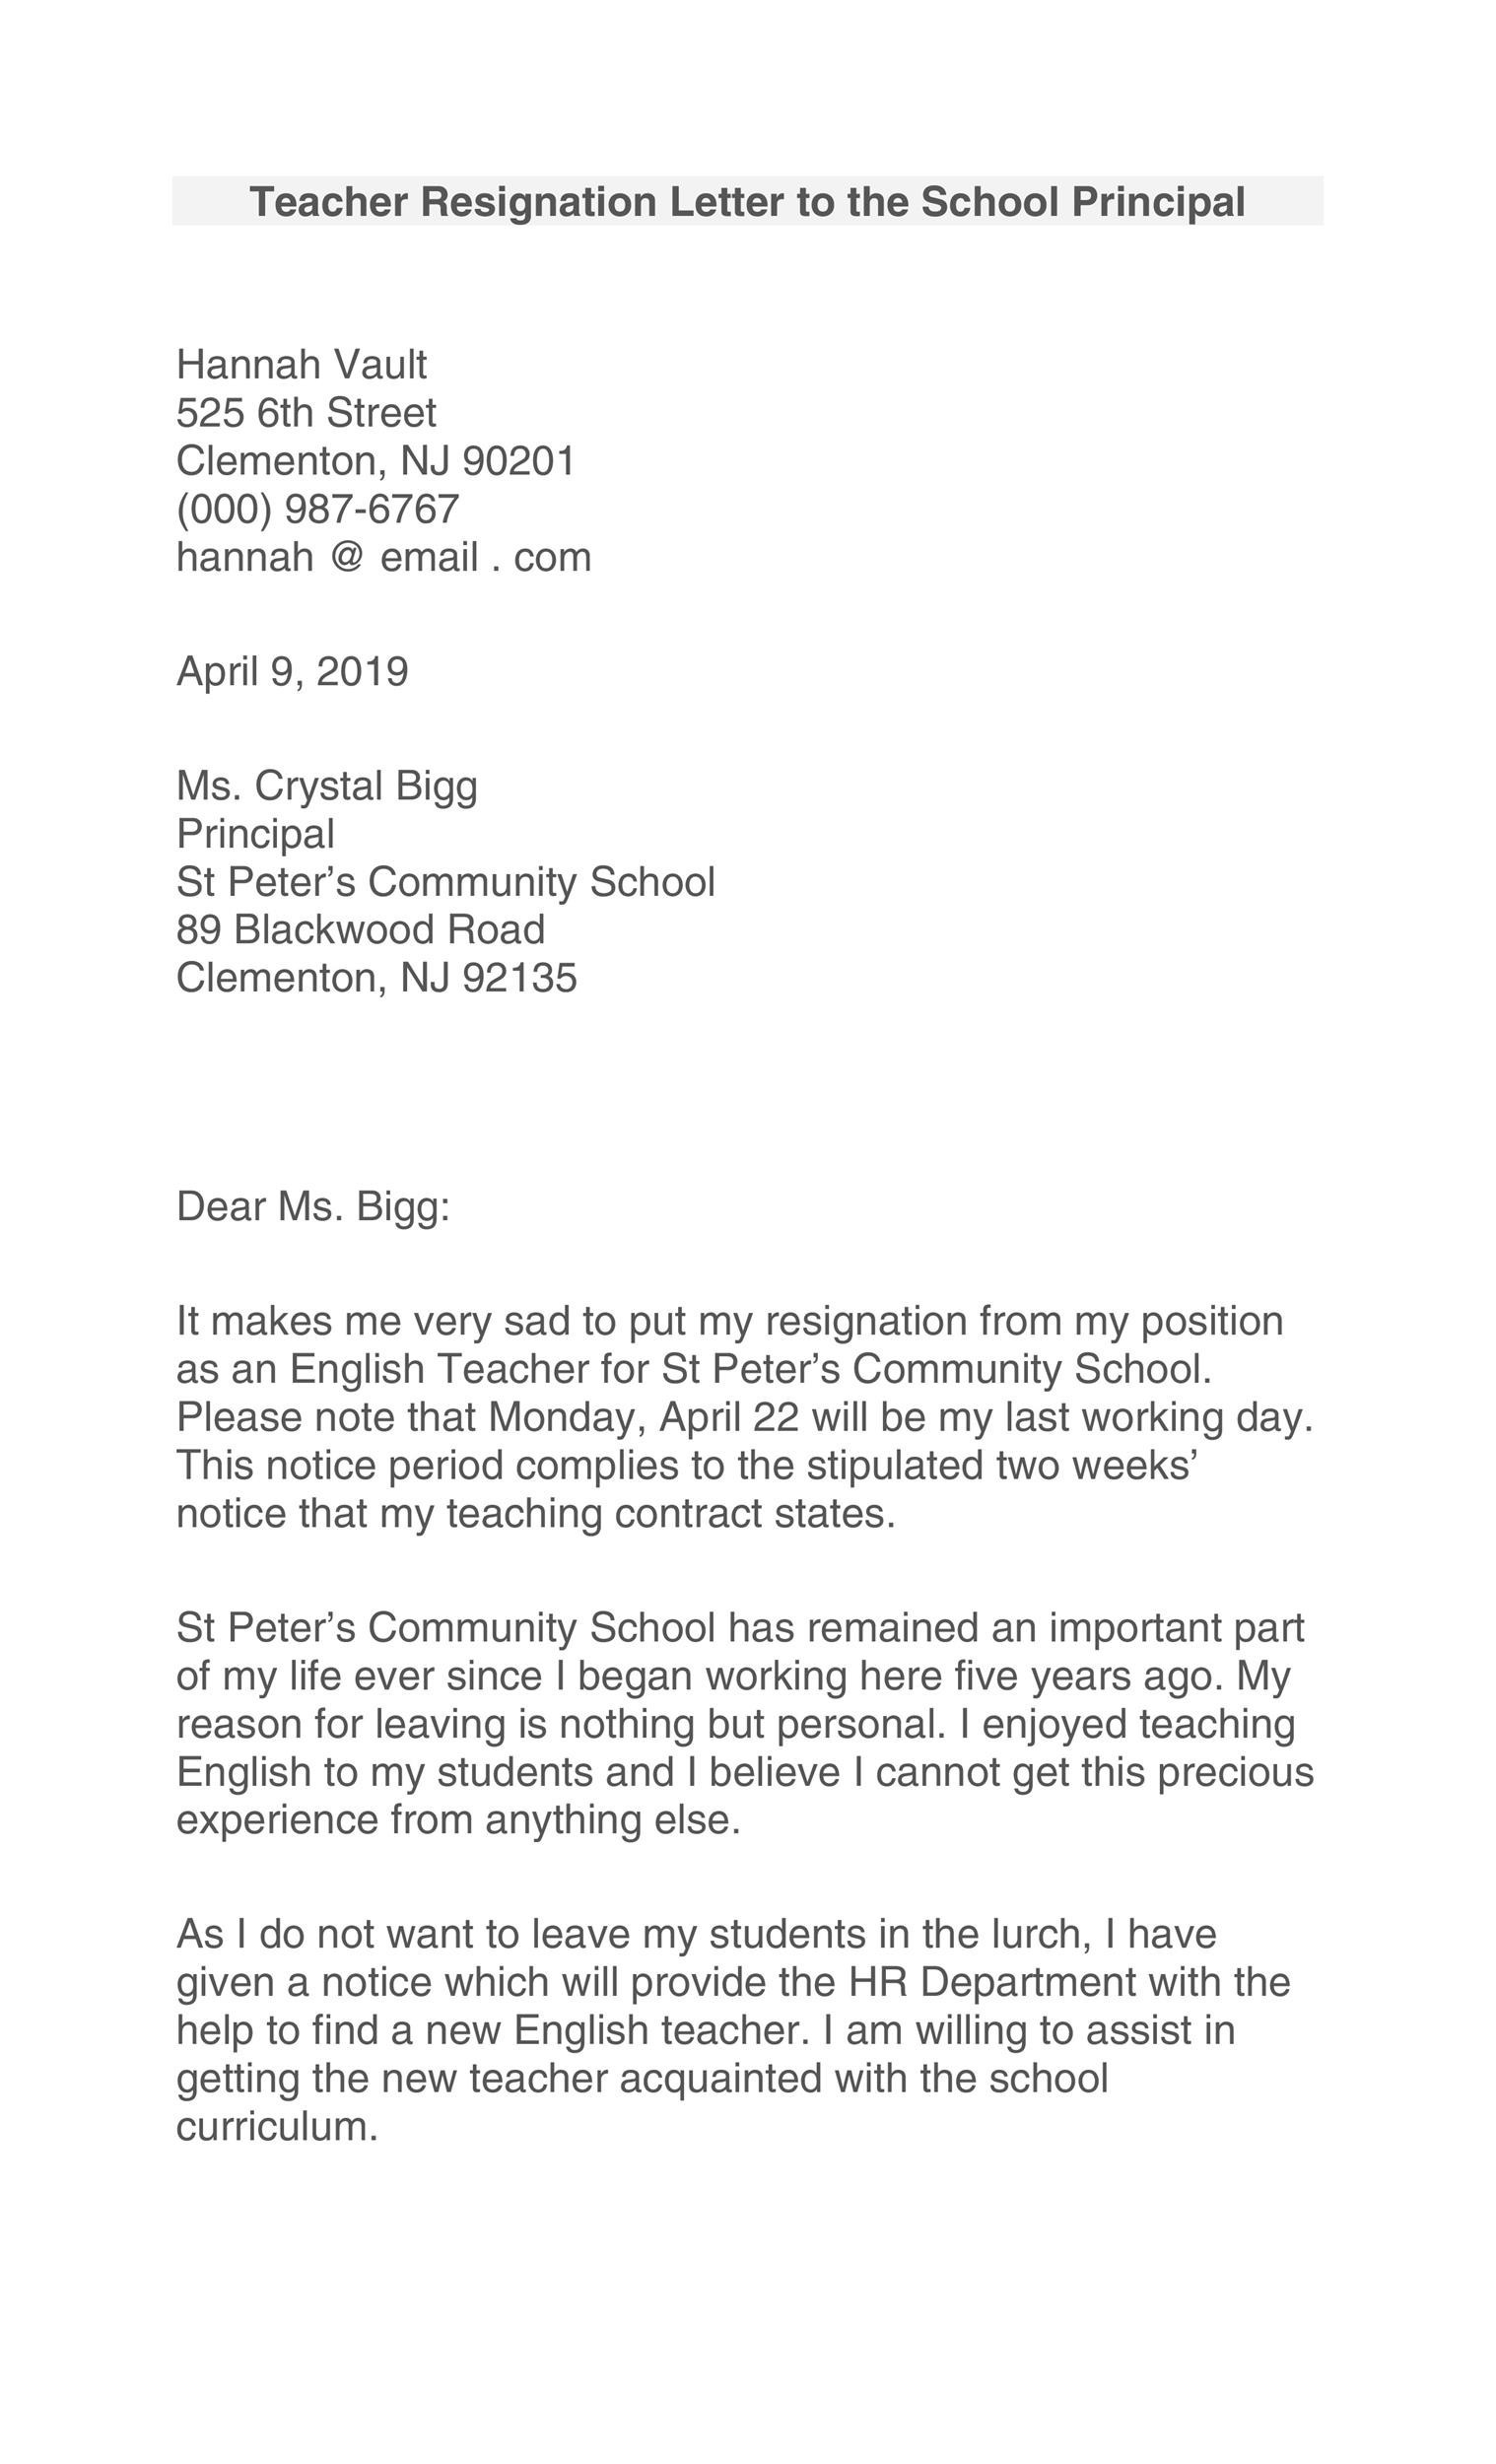 50 BEST Teacher Resignation Letters (MS Word) ᐅ Template Lab